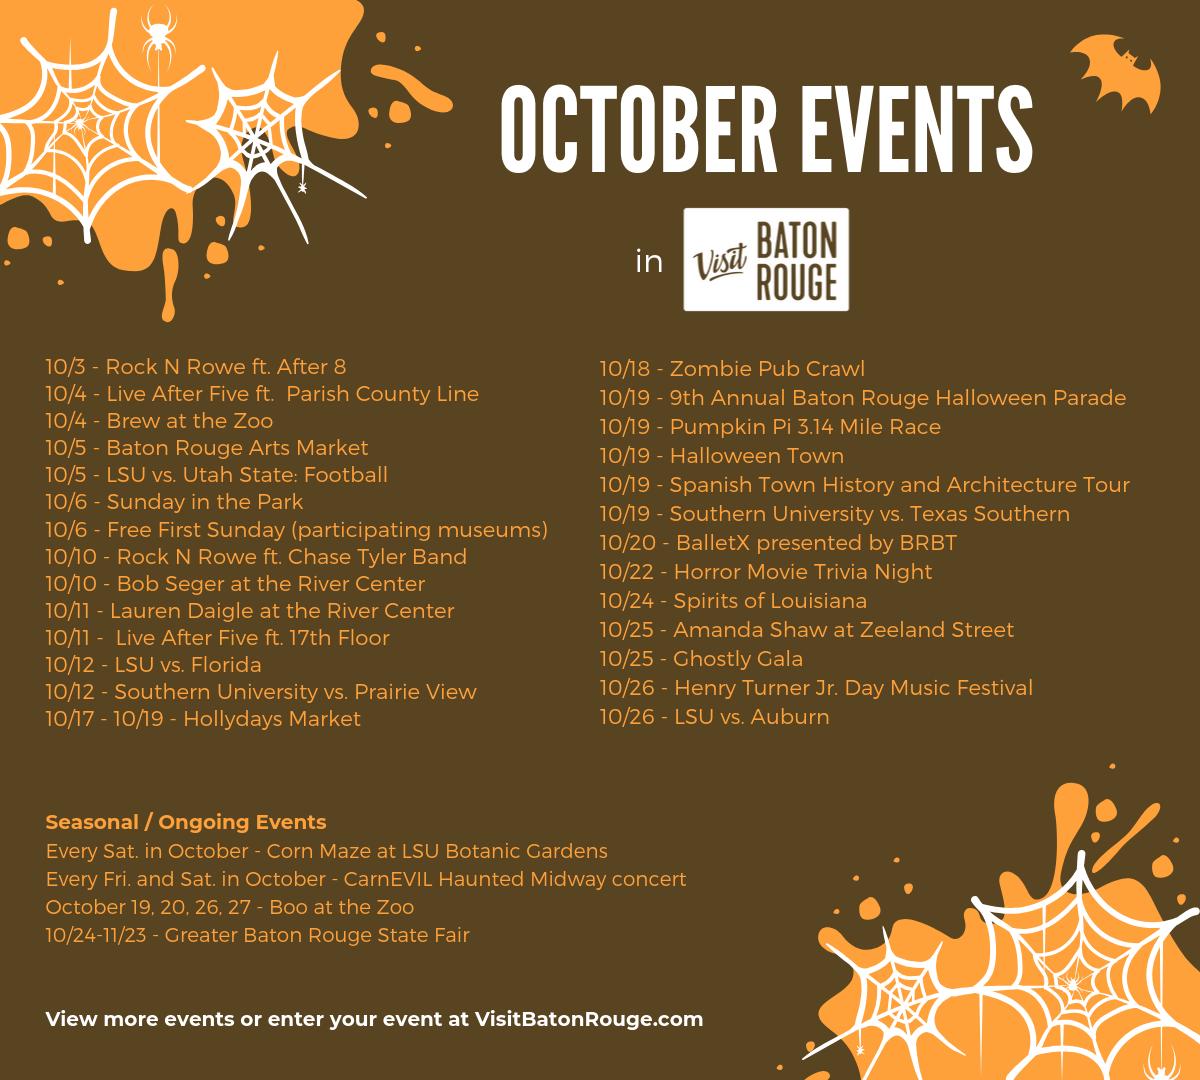 2019 Halloween events